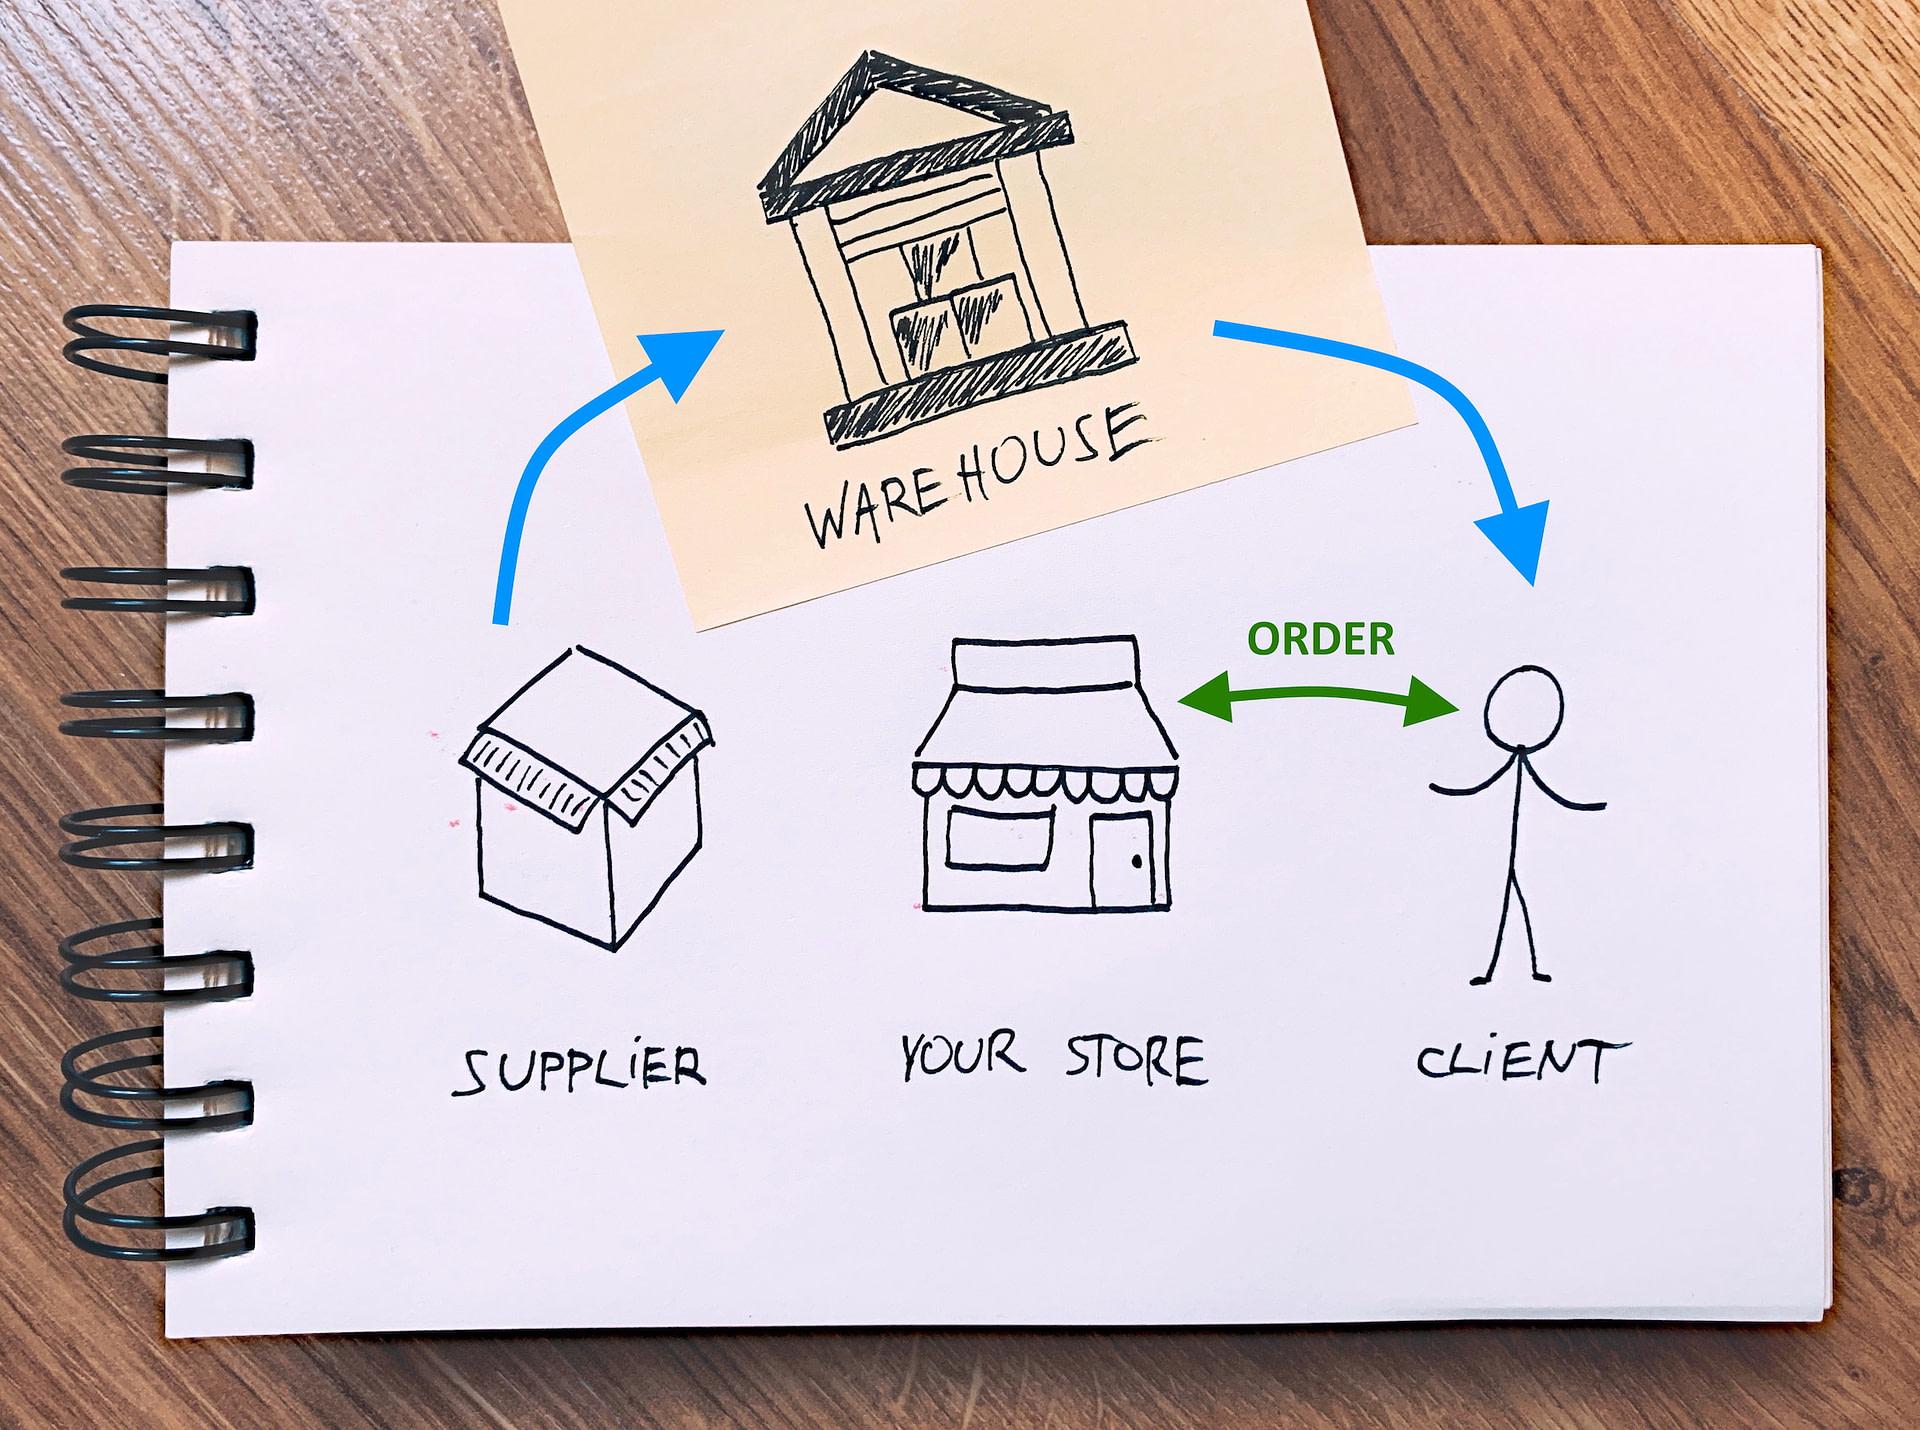 ecommerce fulfillment option #2: third-party logistics